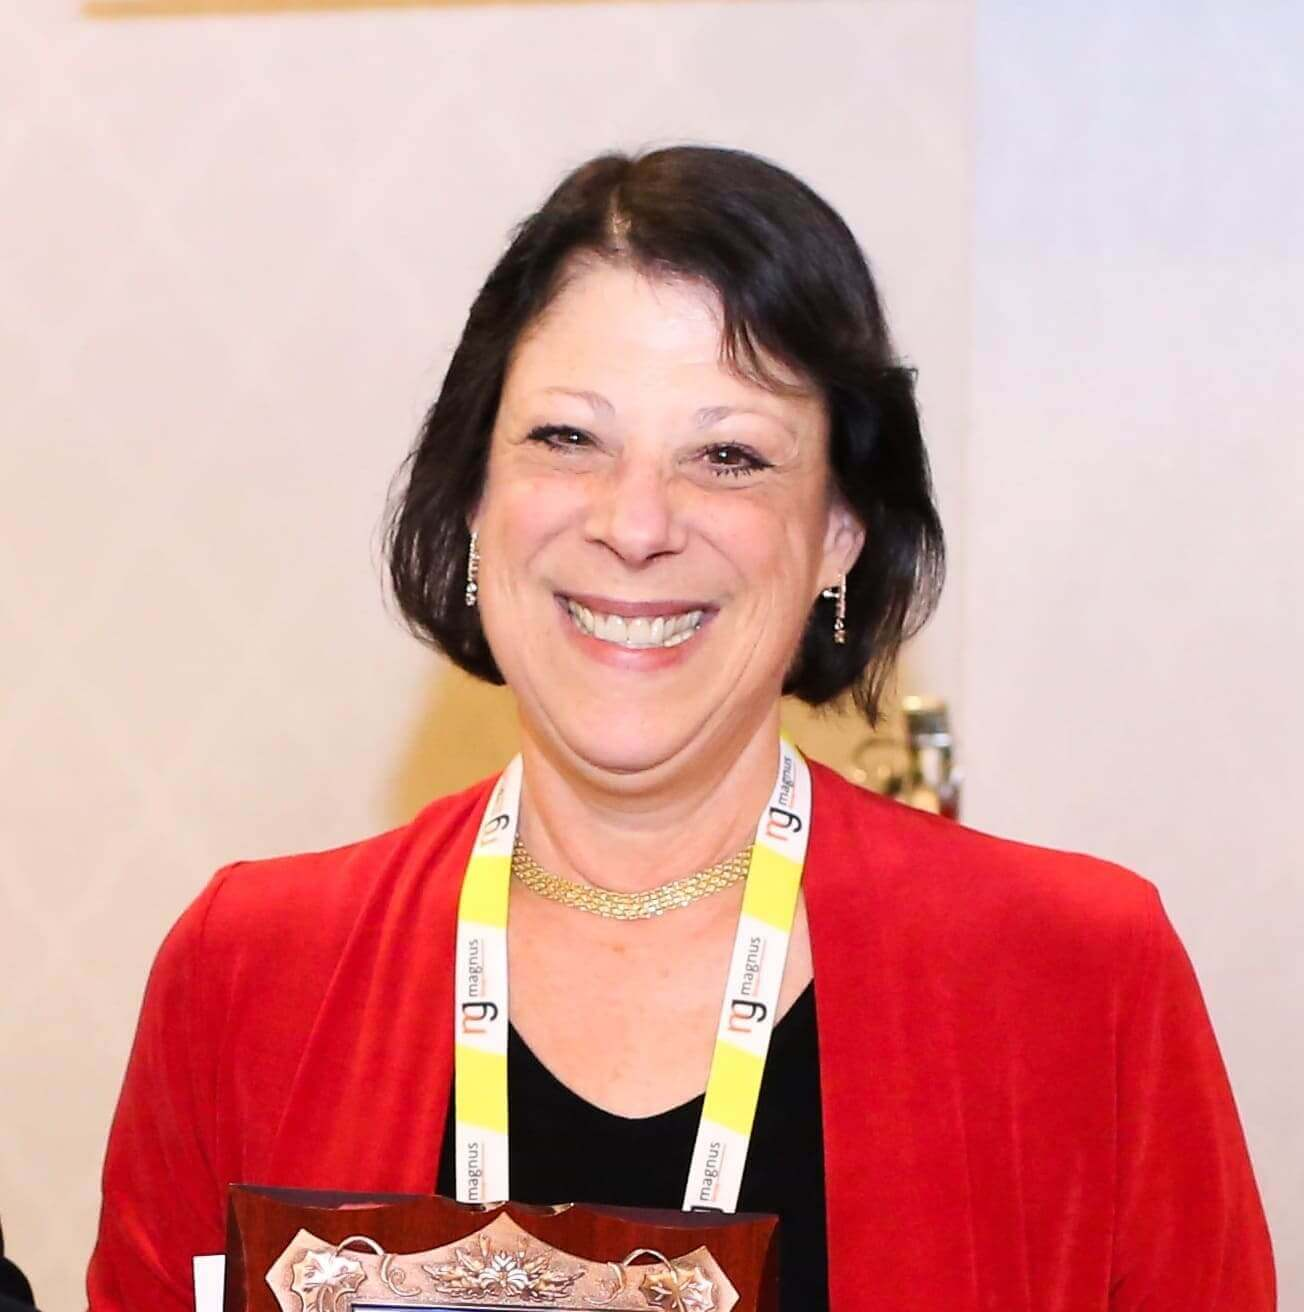 Speaker at upcoming Nursing conferences- Rose Kearney-Nunnery